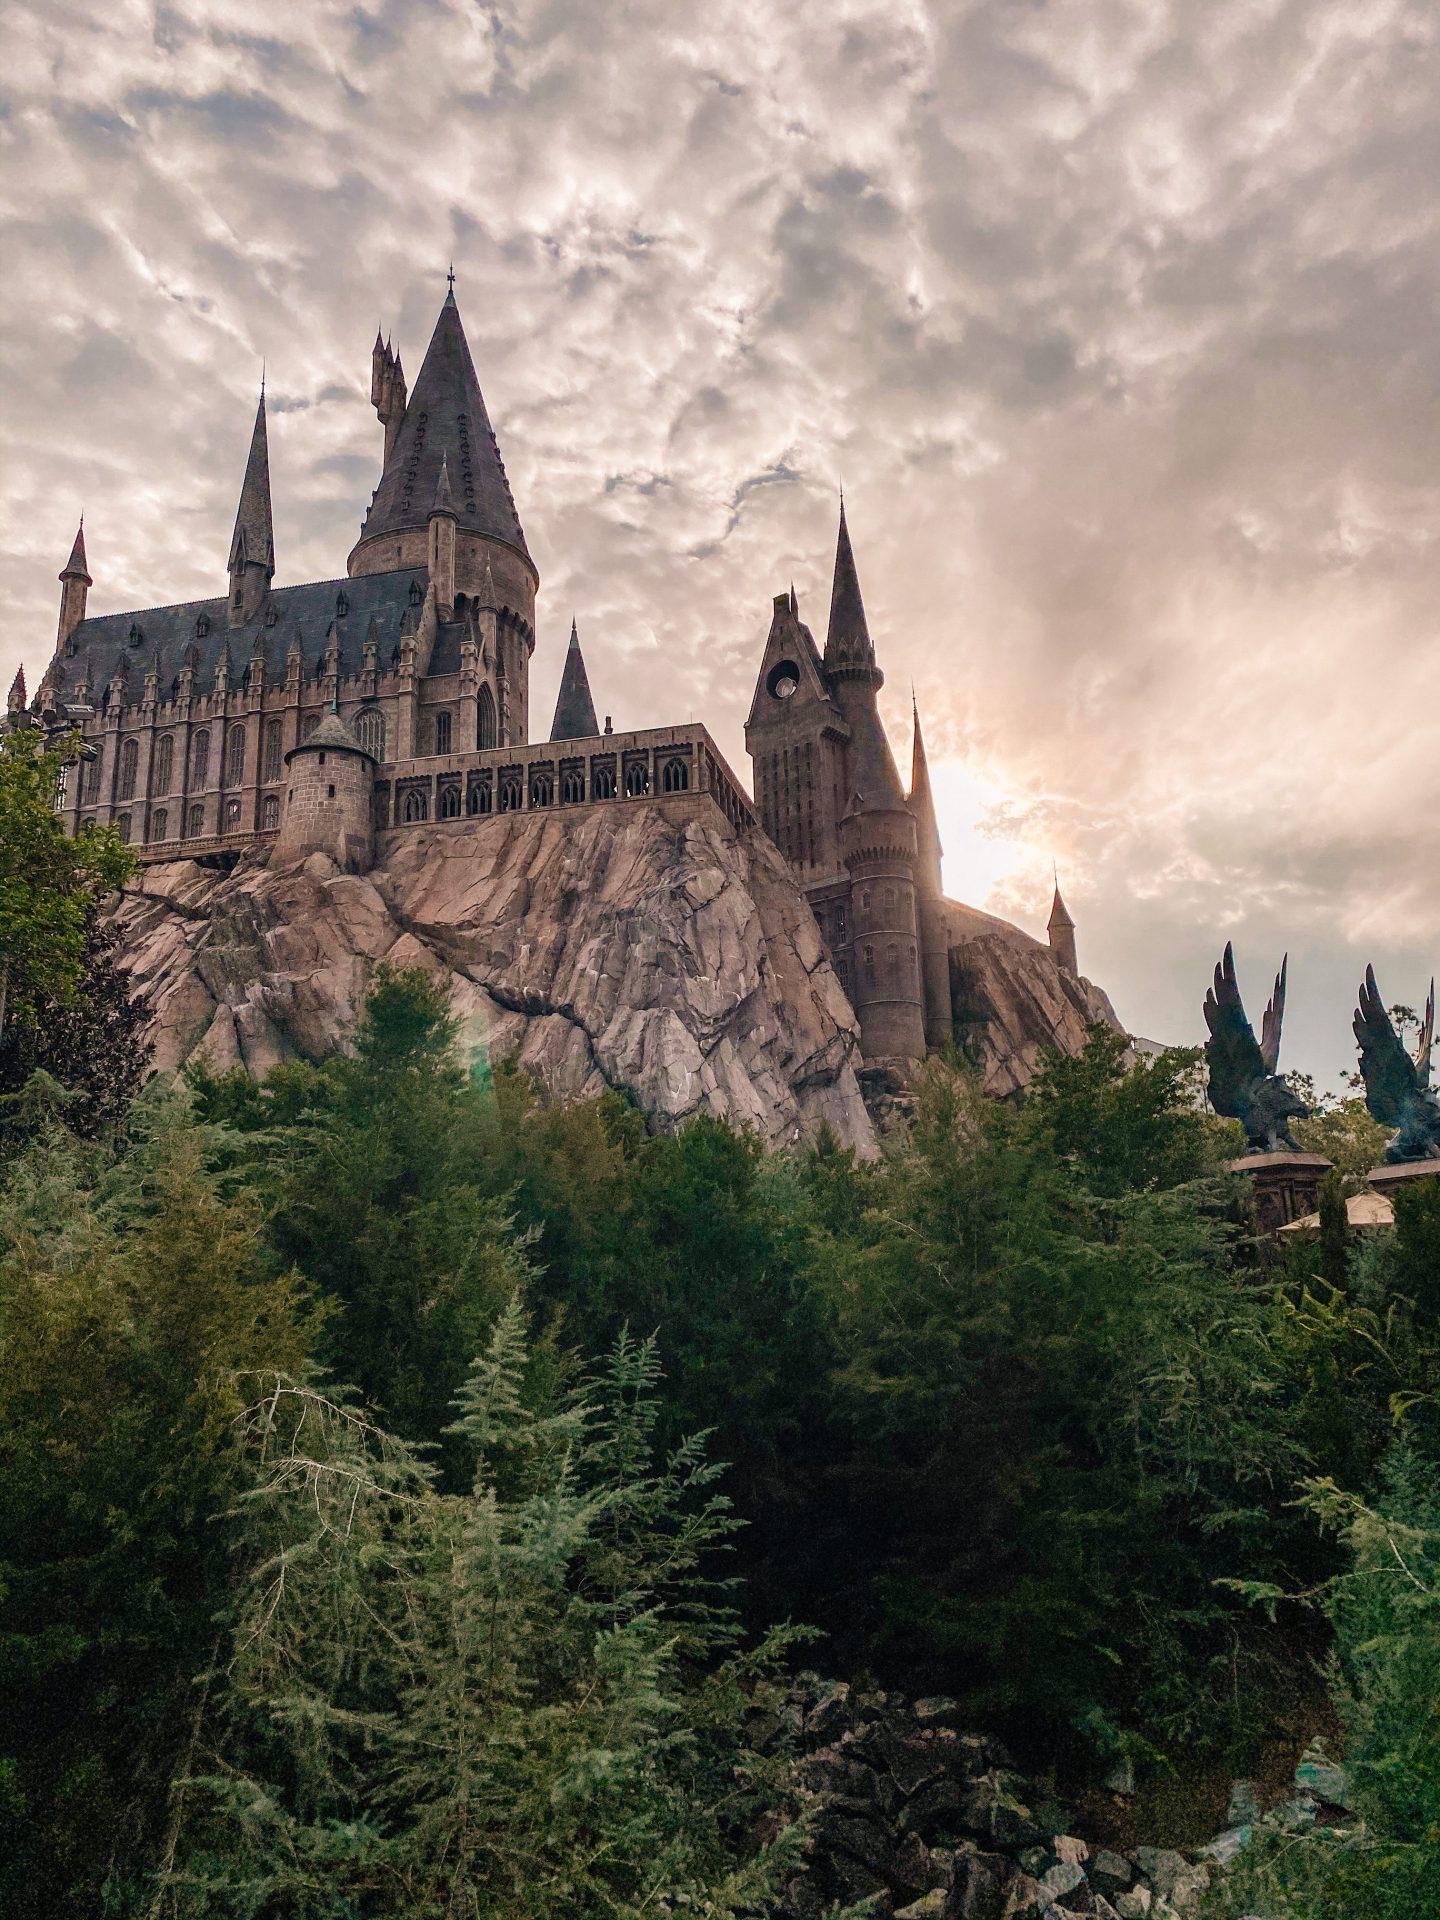 Hogwarts castle at universal studios wizarding world of harry potter